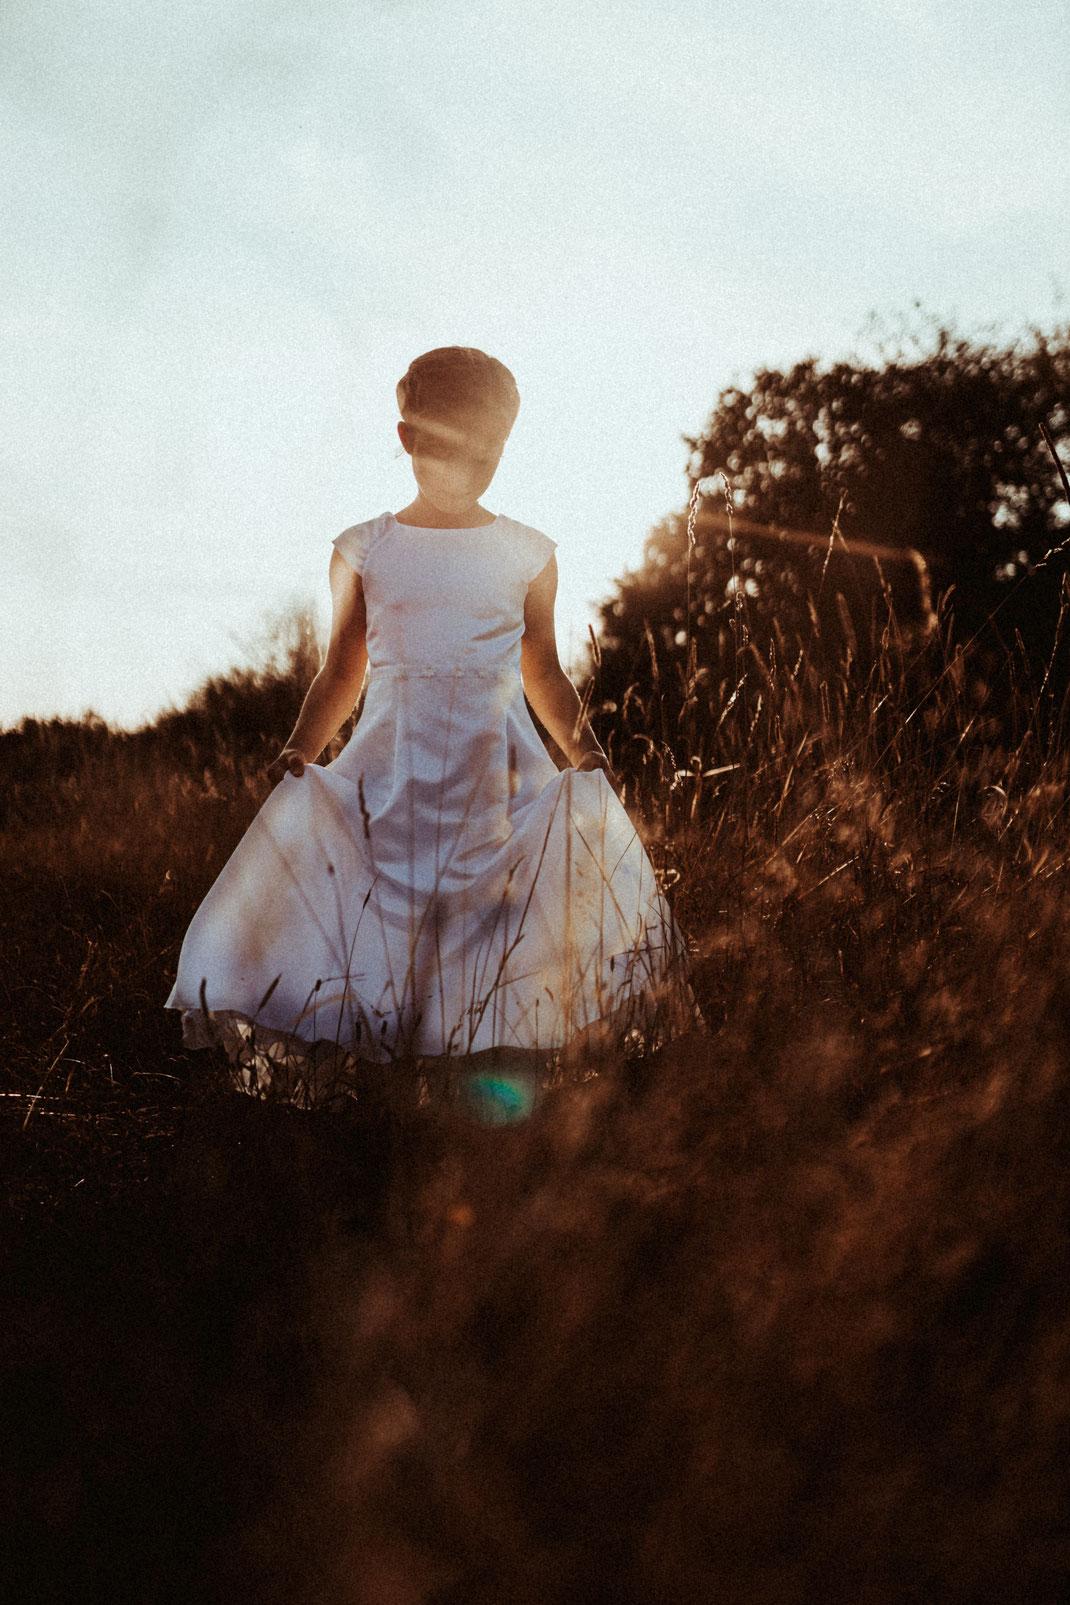 Hochzeitsfotograf Saarland - Fotograf Kai Kreutzer 70